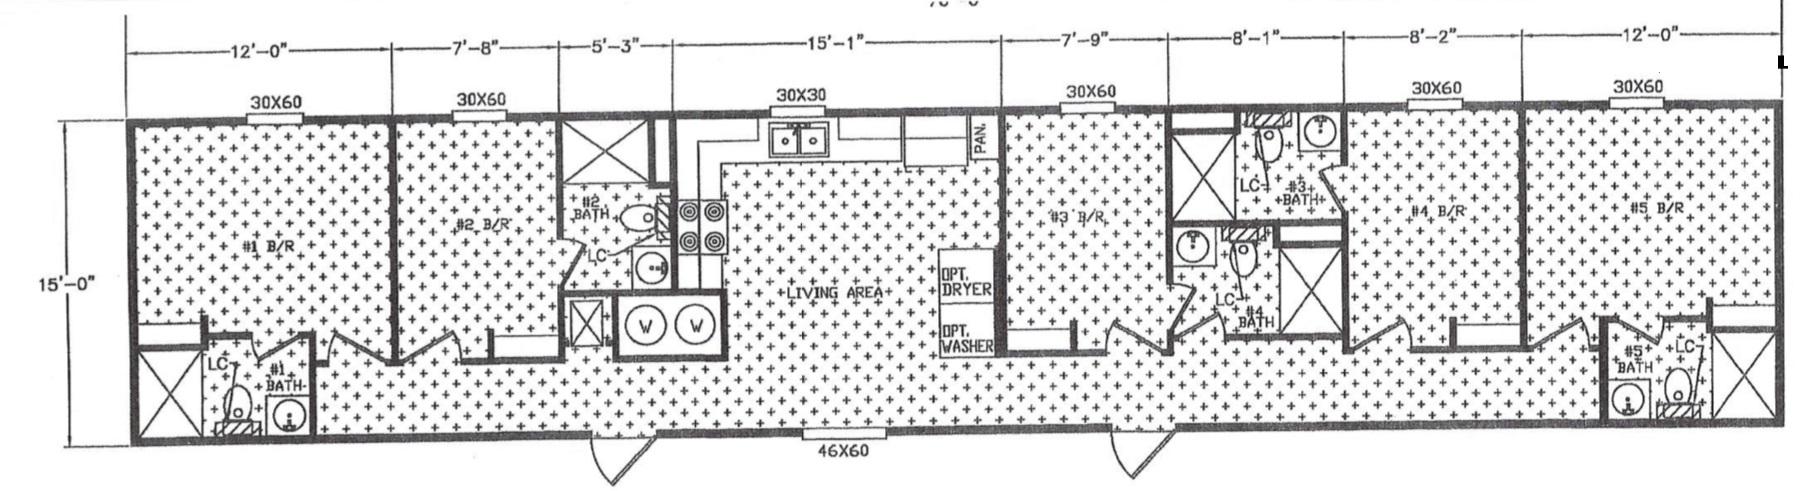 workforce housing floor plan 5 bedroom 5 bath